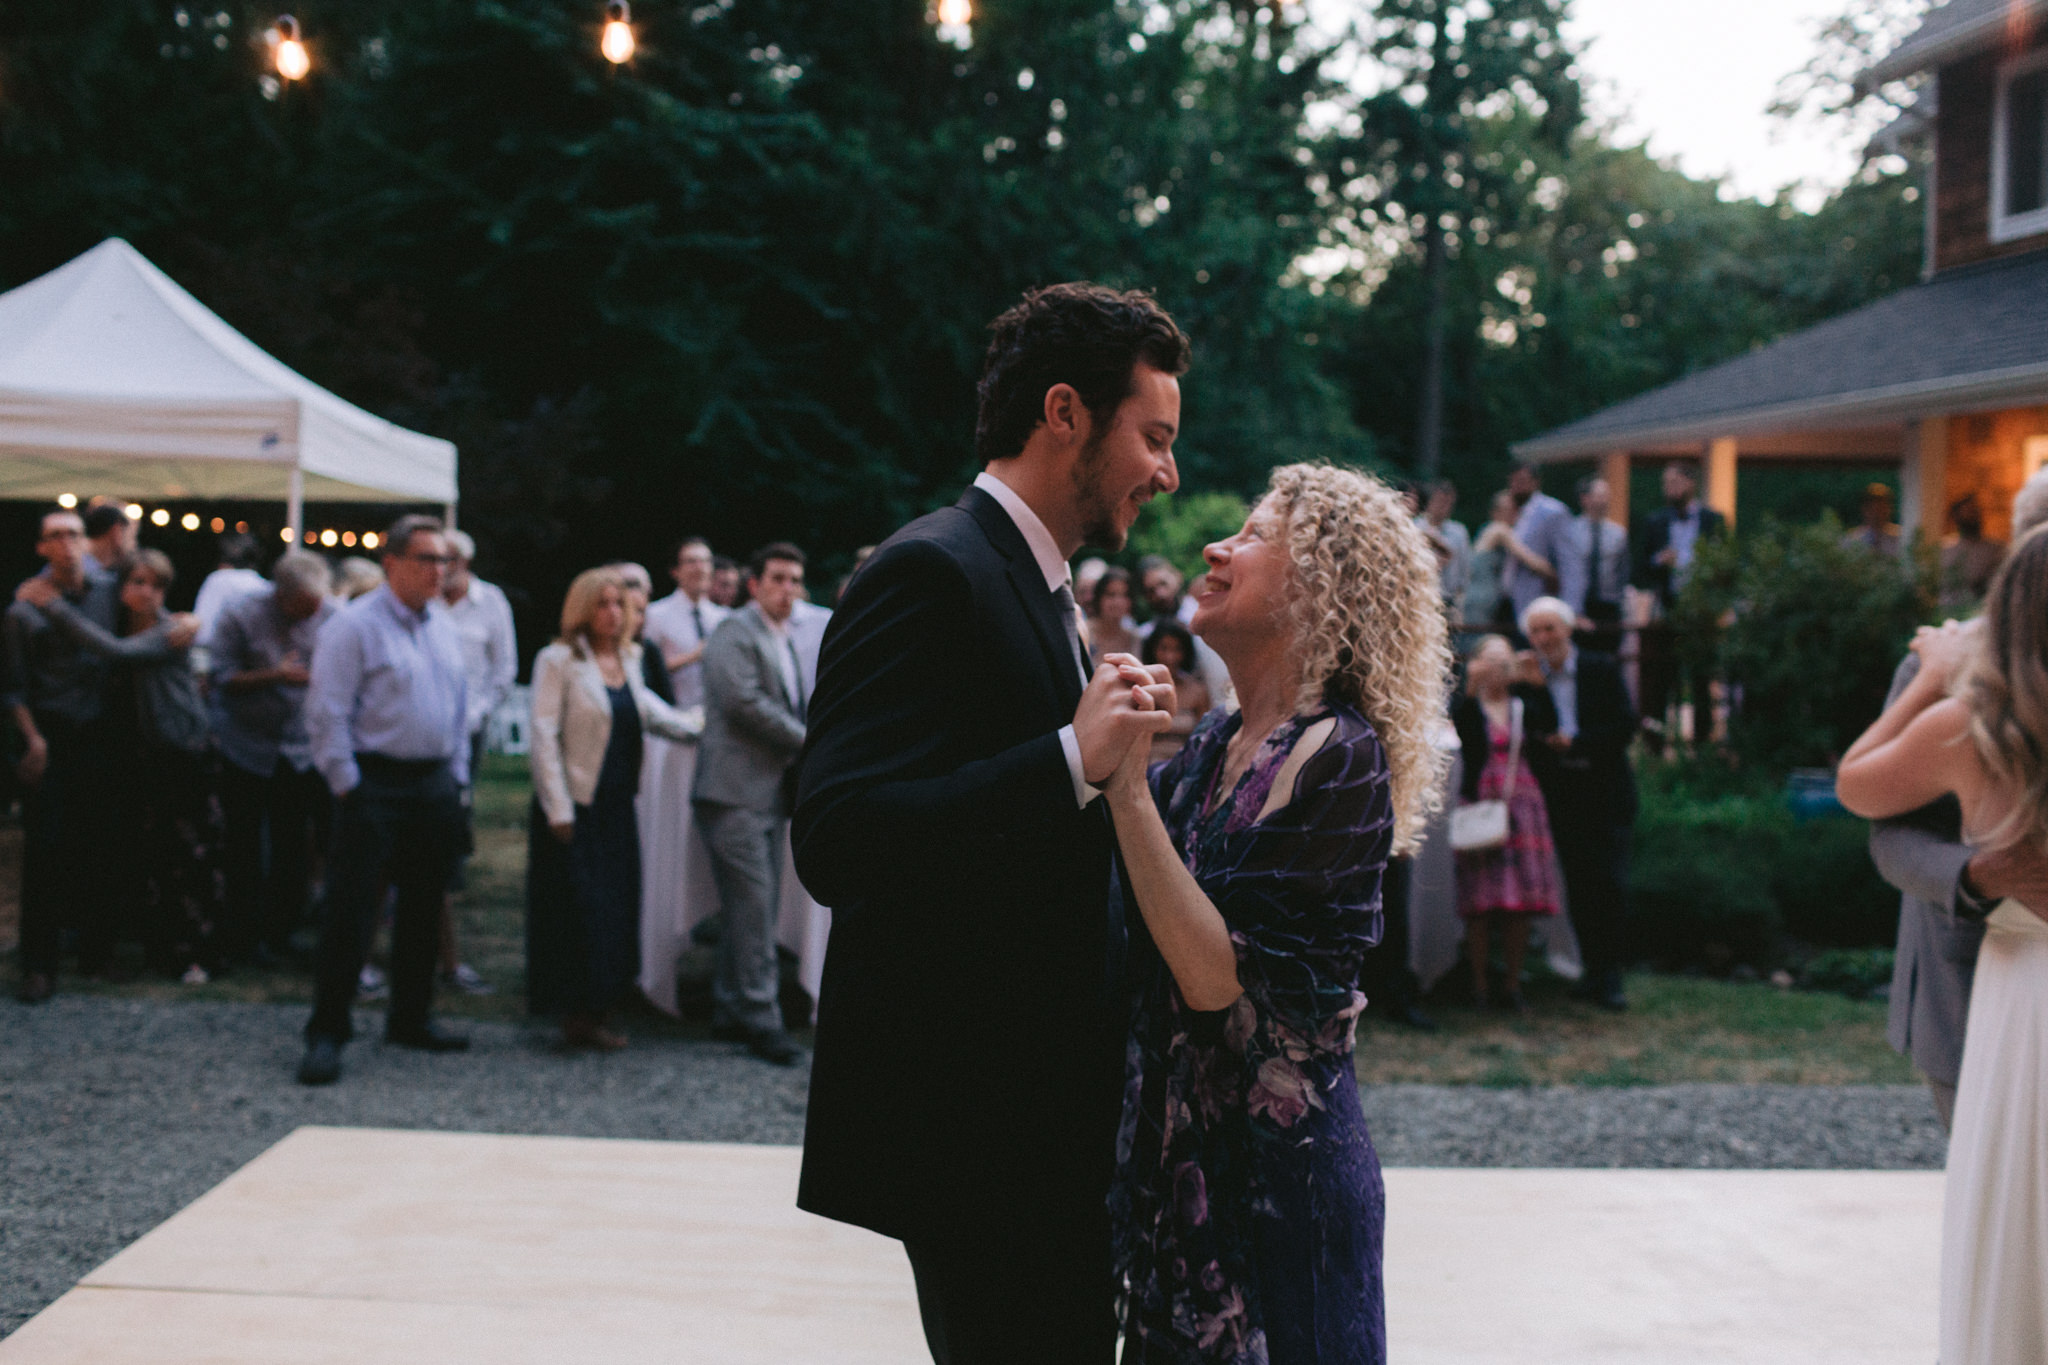 Backyard-Bainbridge-Island-Wedding-Alycia-Lovell-Photography-231.JPG